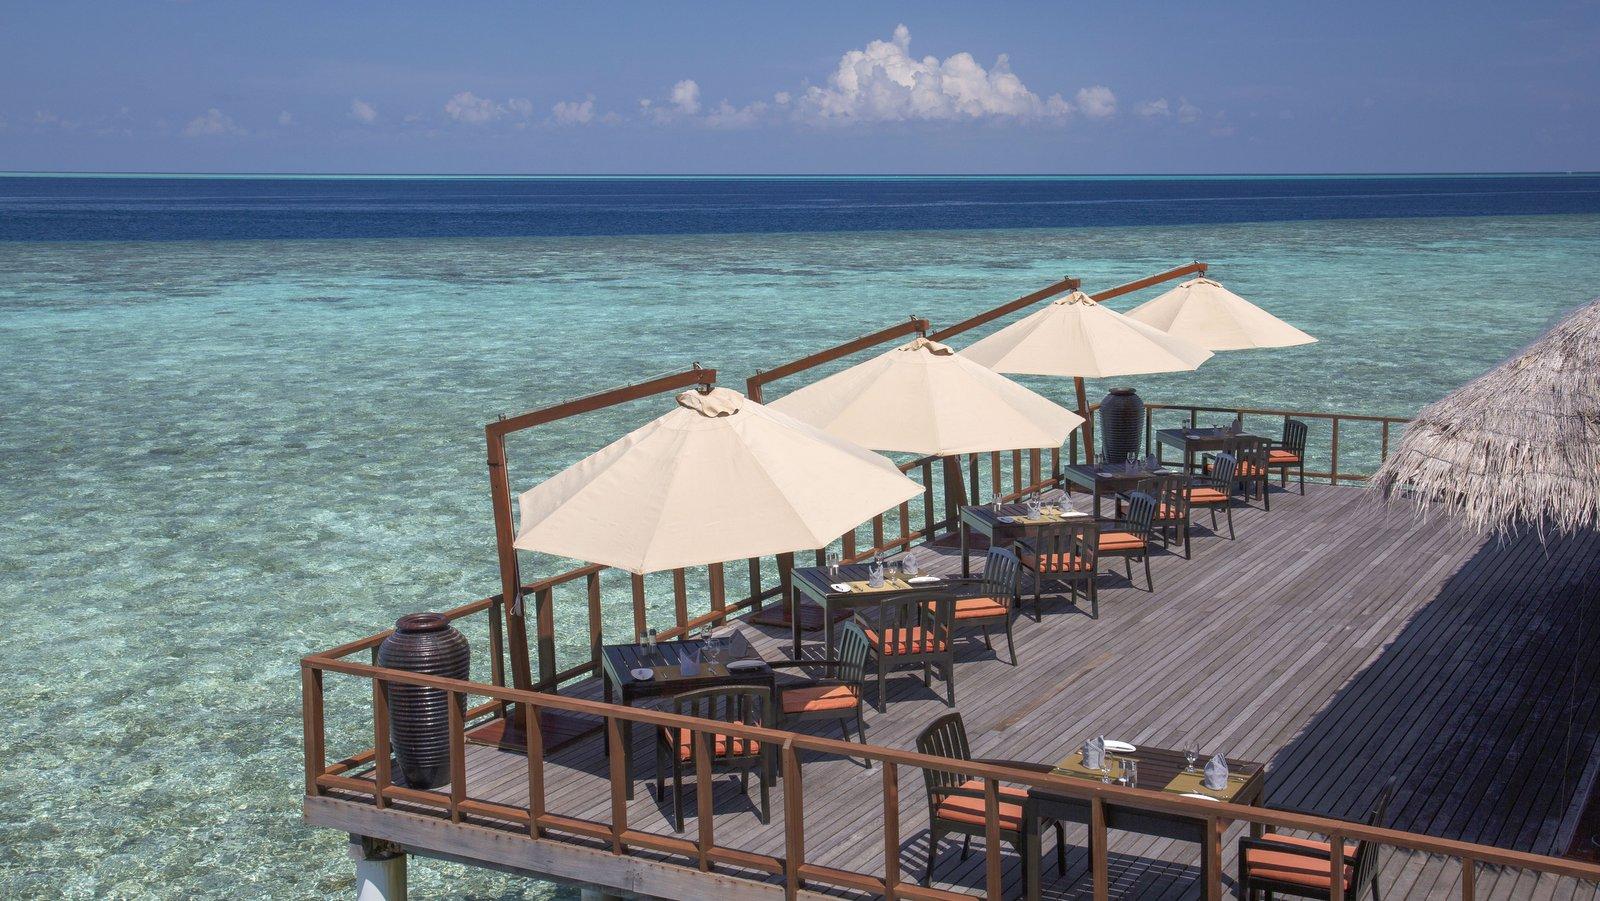 Мальдивы, отель Coco Palm Bodu Hithi, ресторан STARS